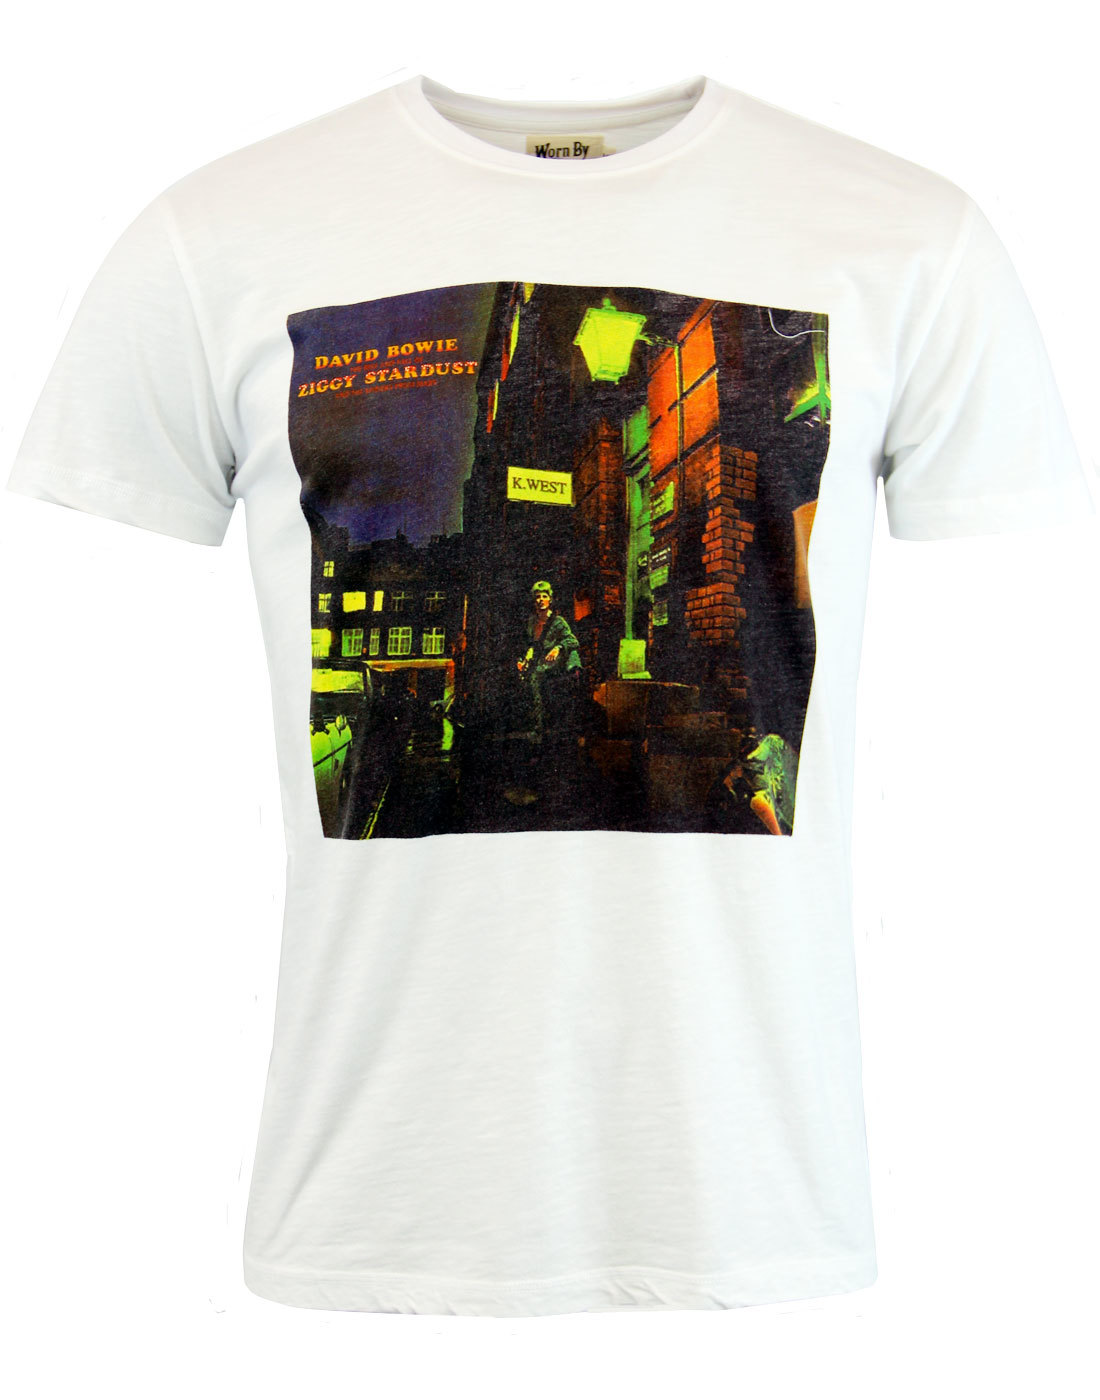 Ziggy Stardust WORN BY Retro 1970s Album T-shirt